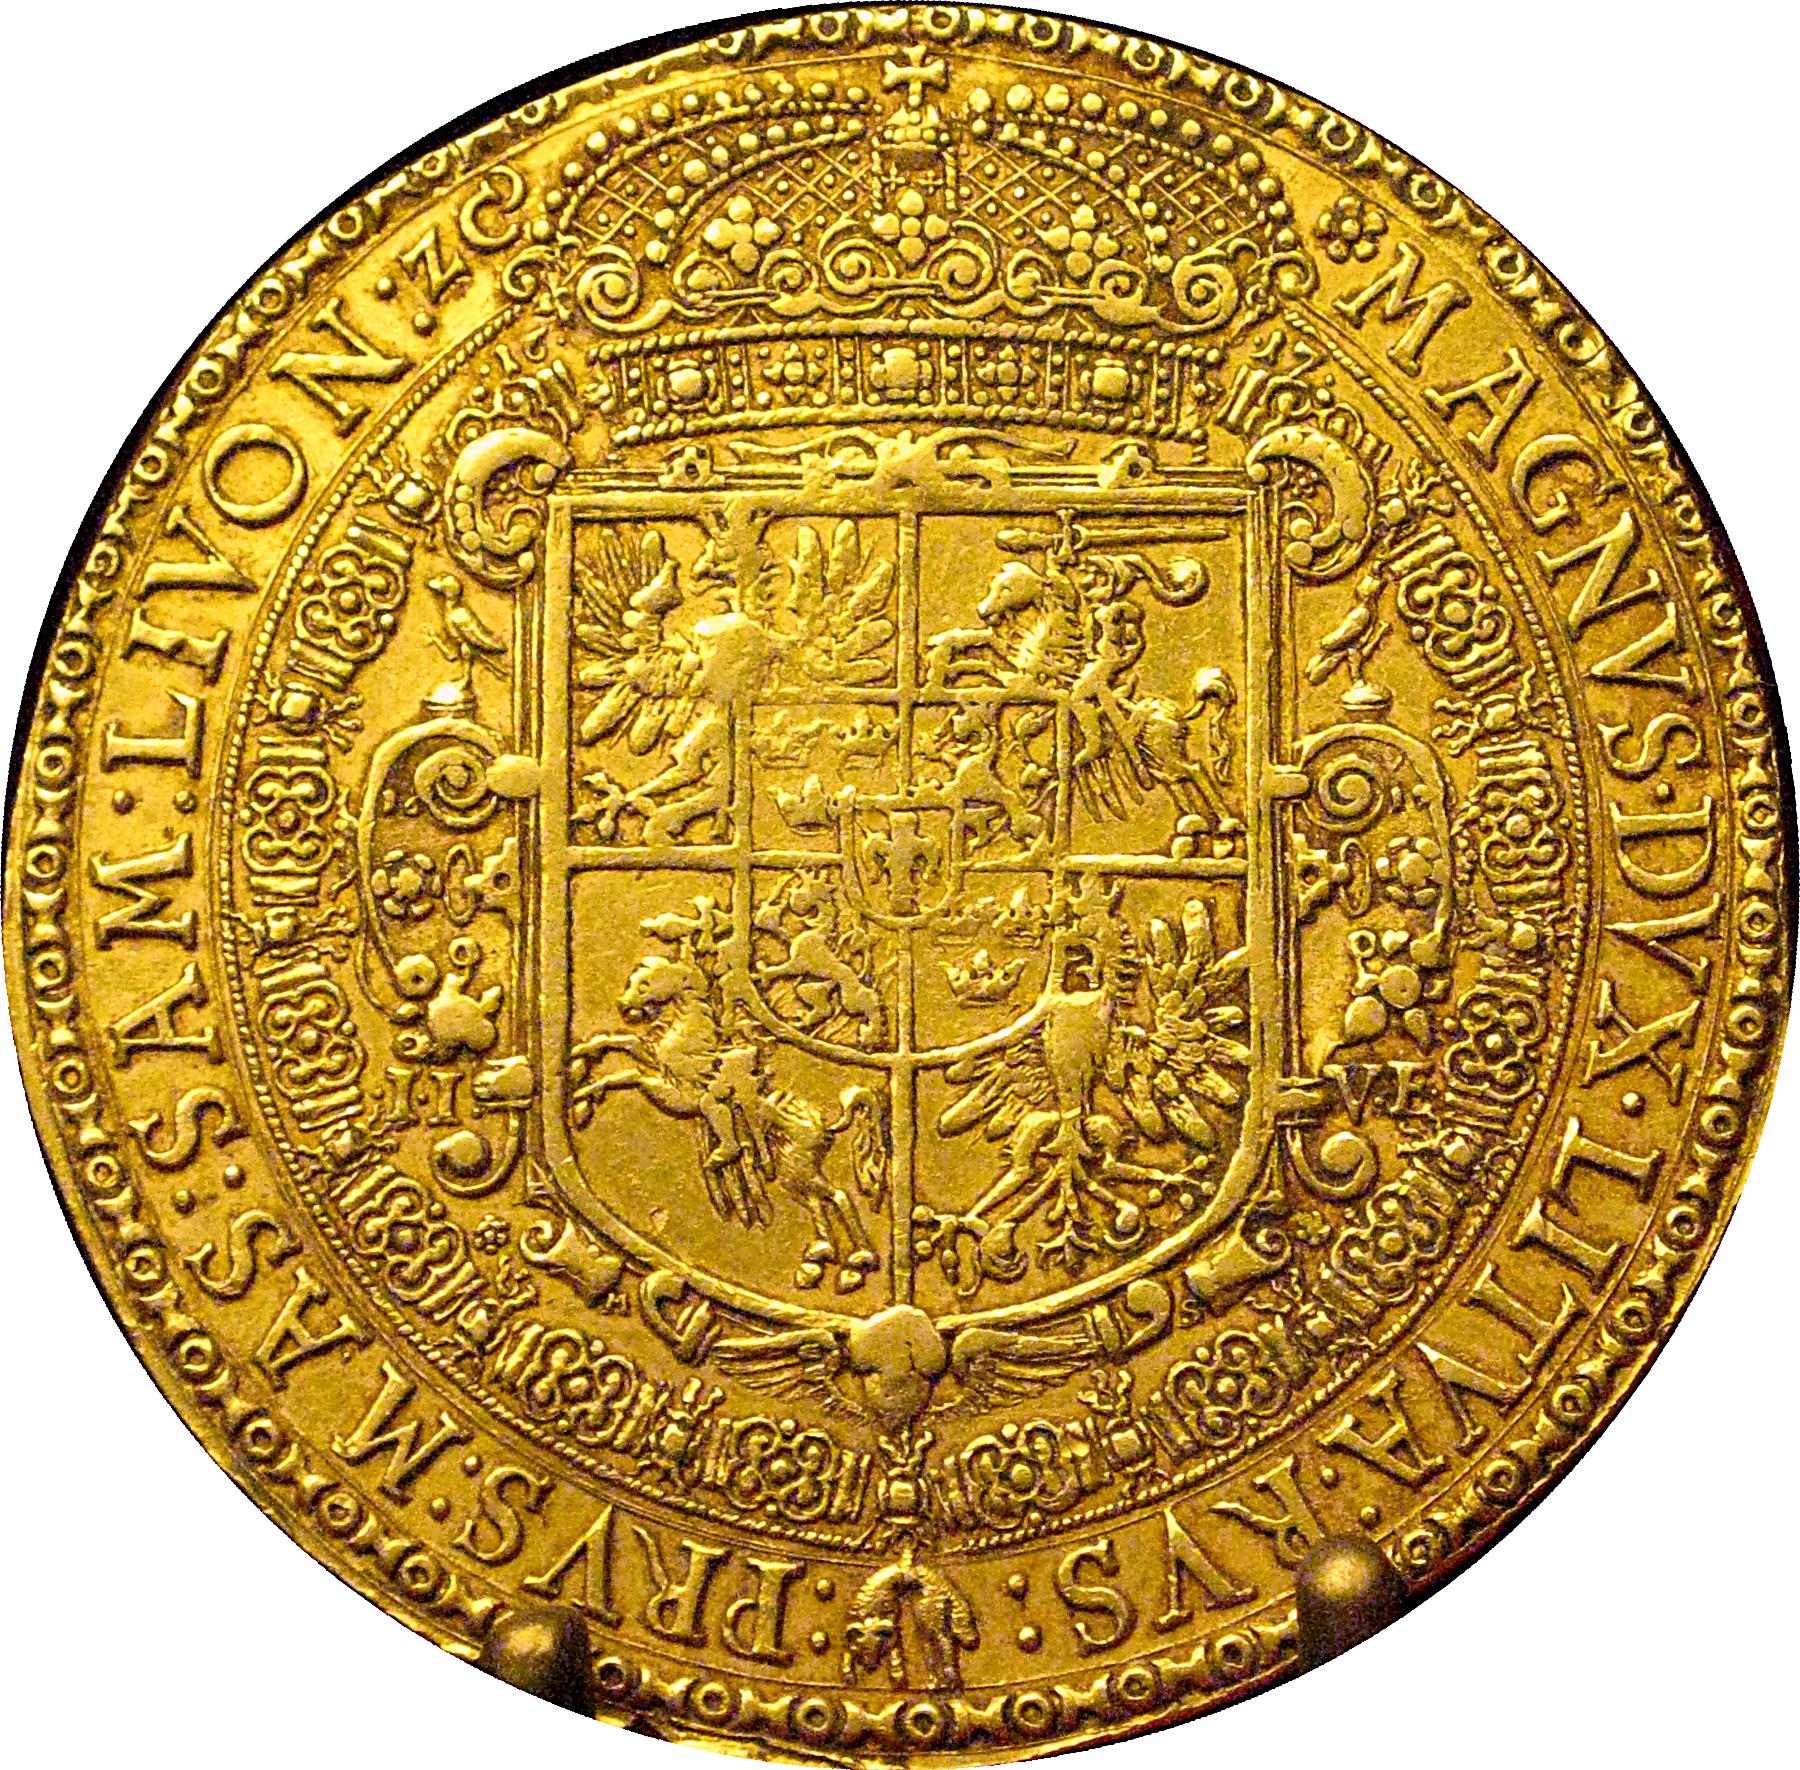 15 ducats of Sigismund III Vasa from 1617.